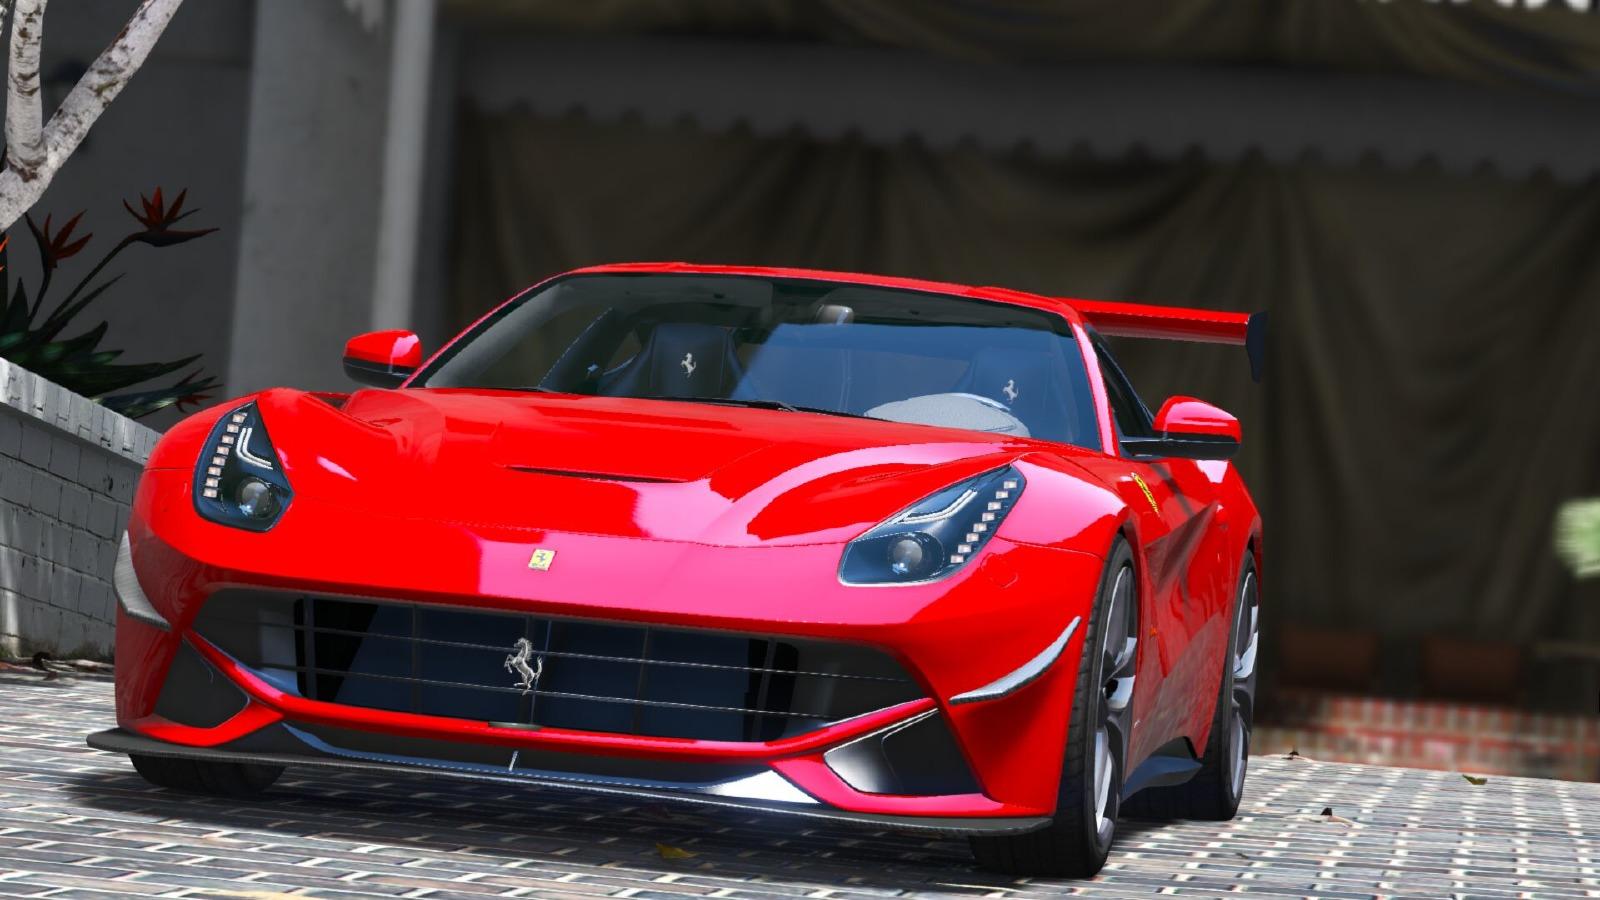 Ferrari F12 Berlinetta 2013 Vehicules Pour GTA V Sur GTA